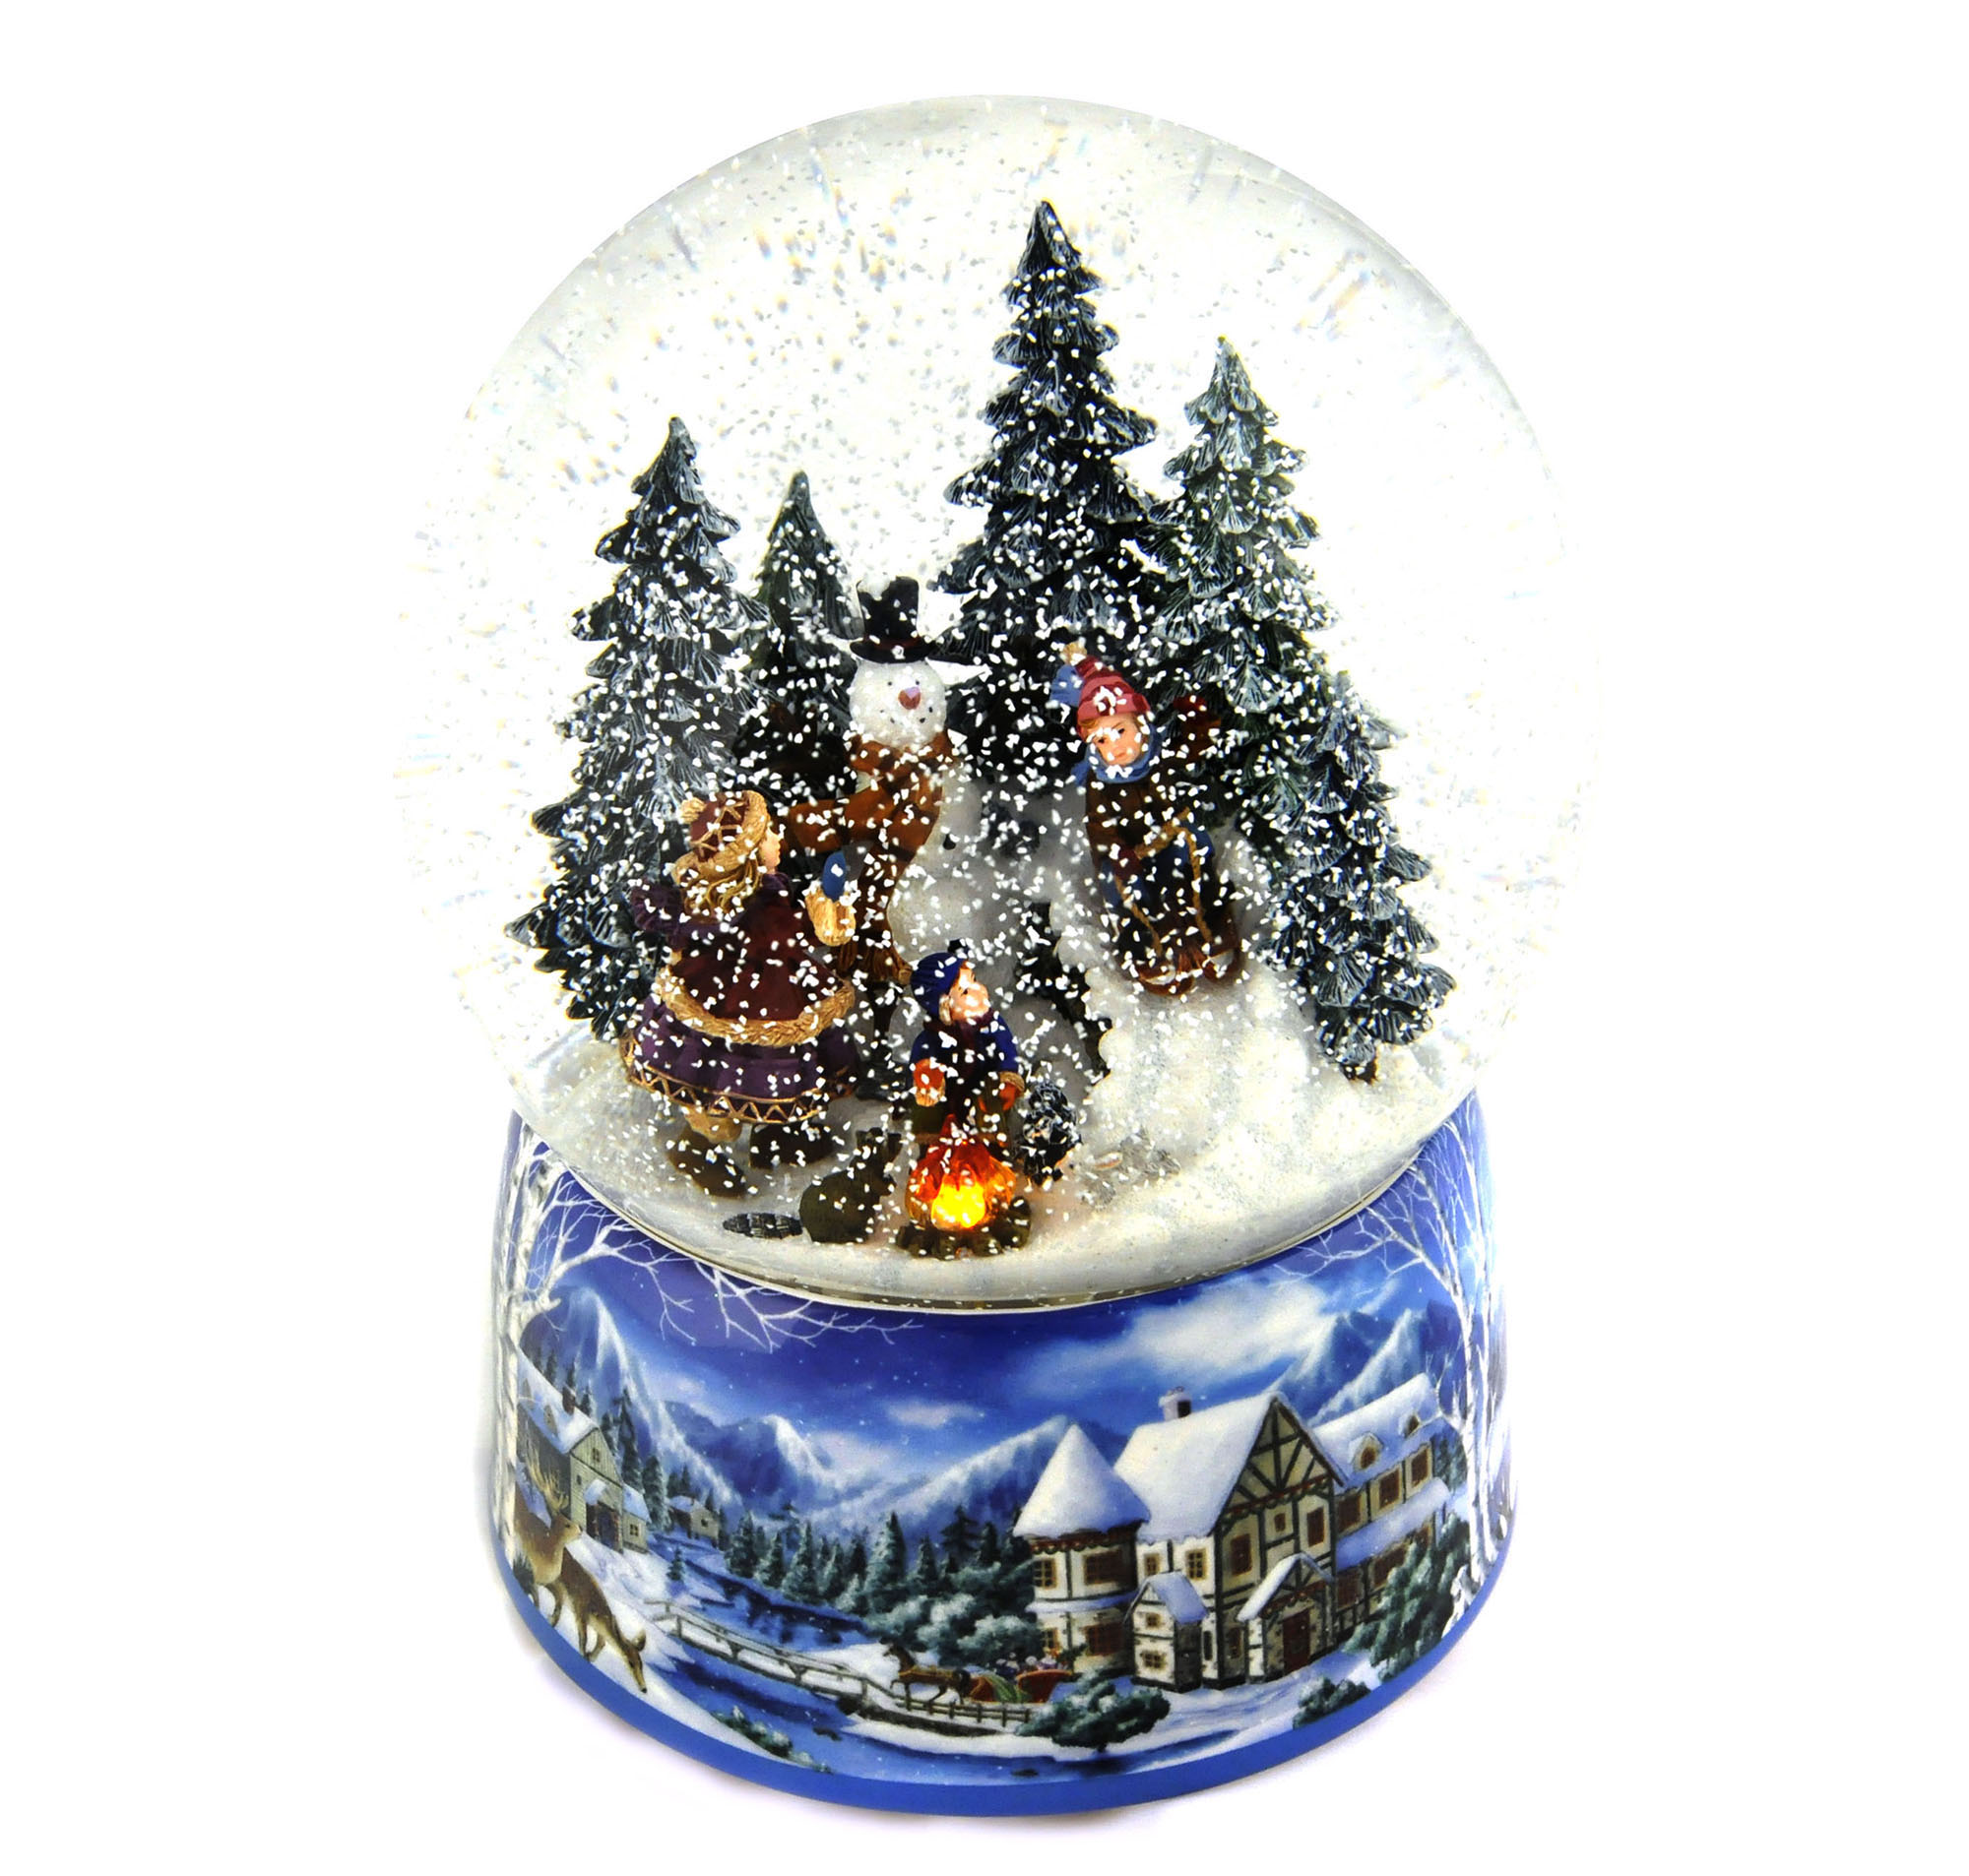 Christmas Light Up Gift Boxes